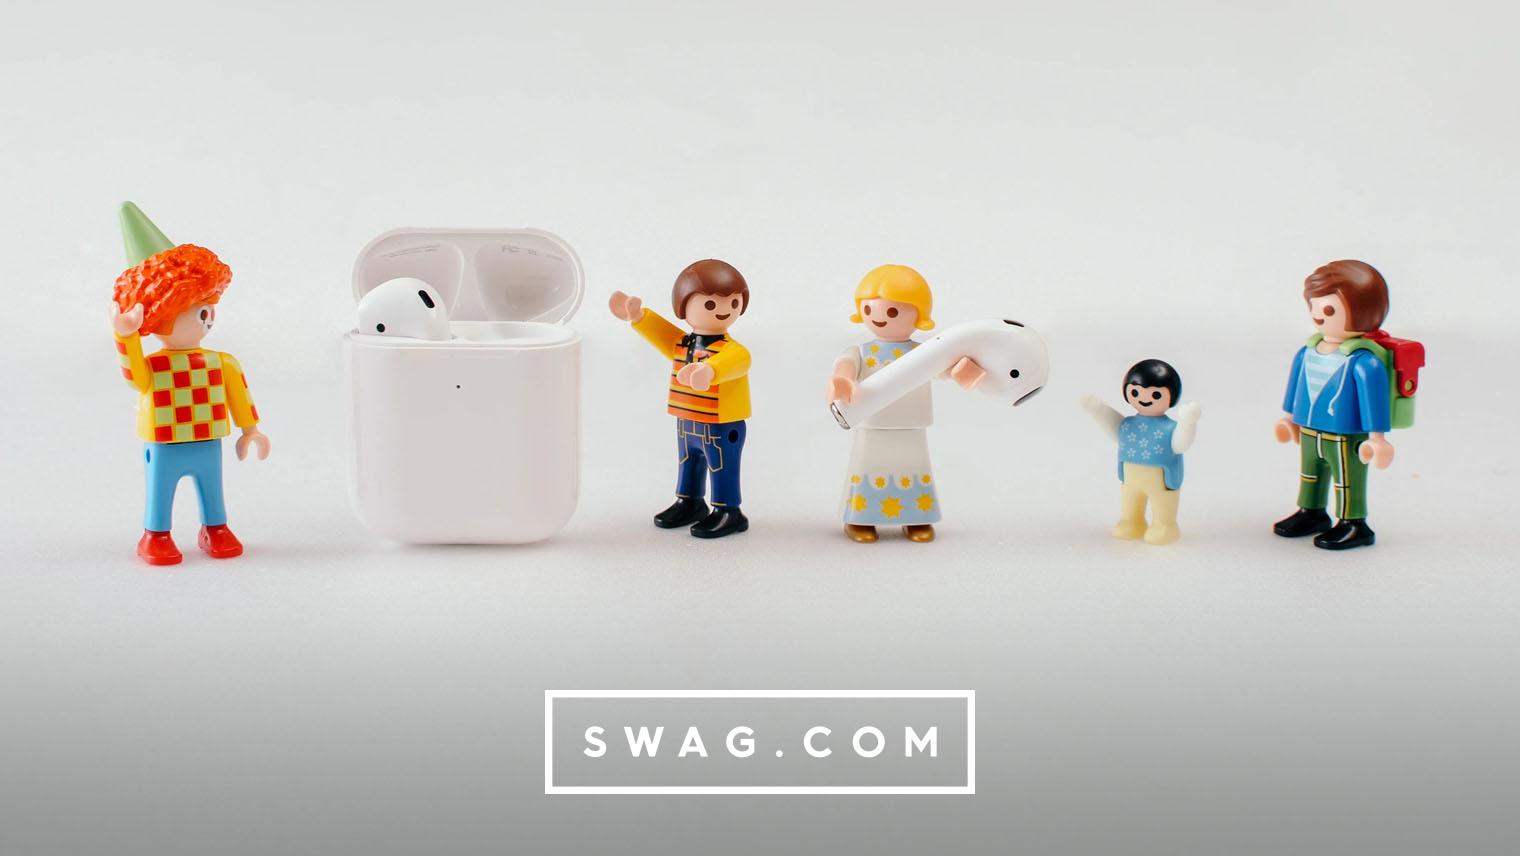 Tech Swag